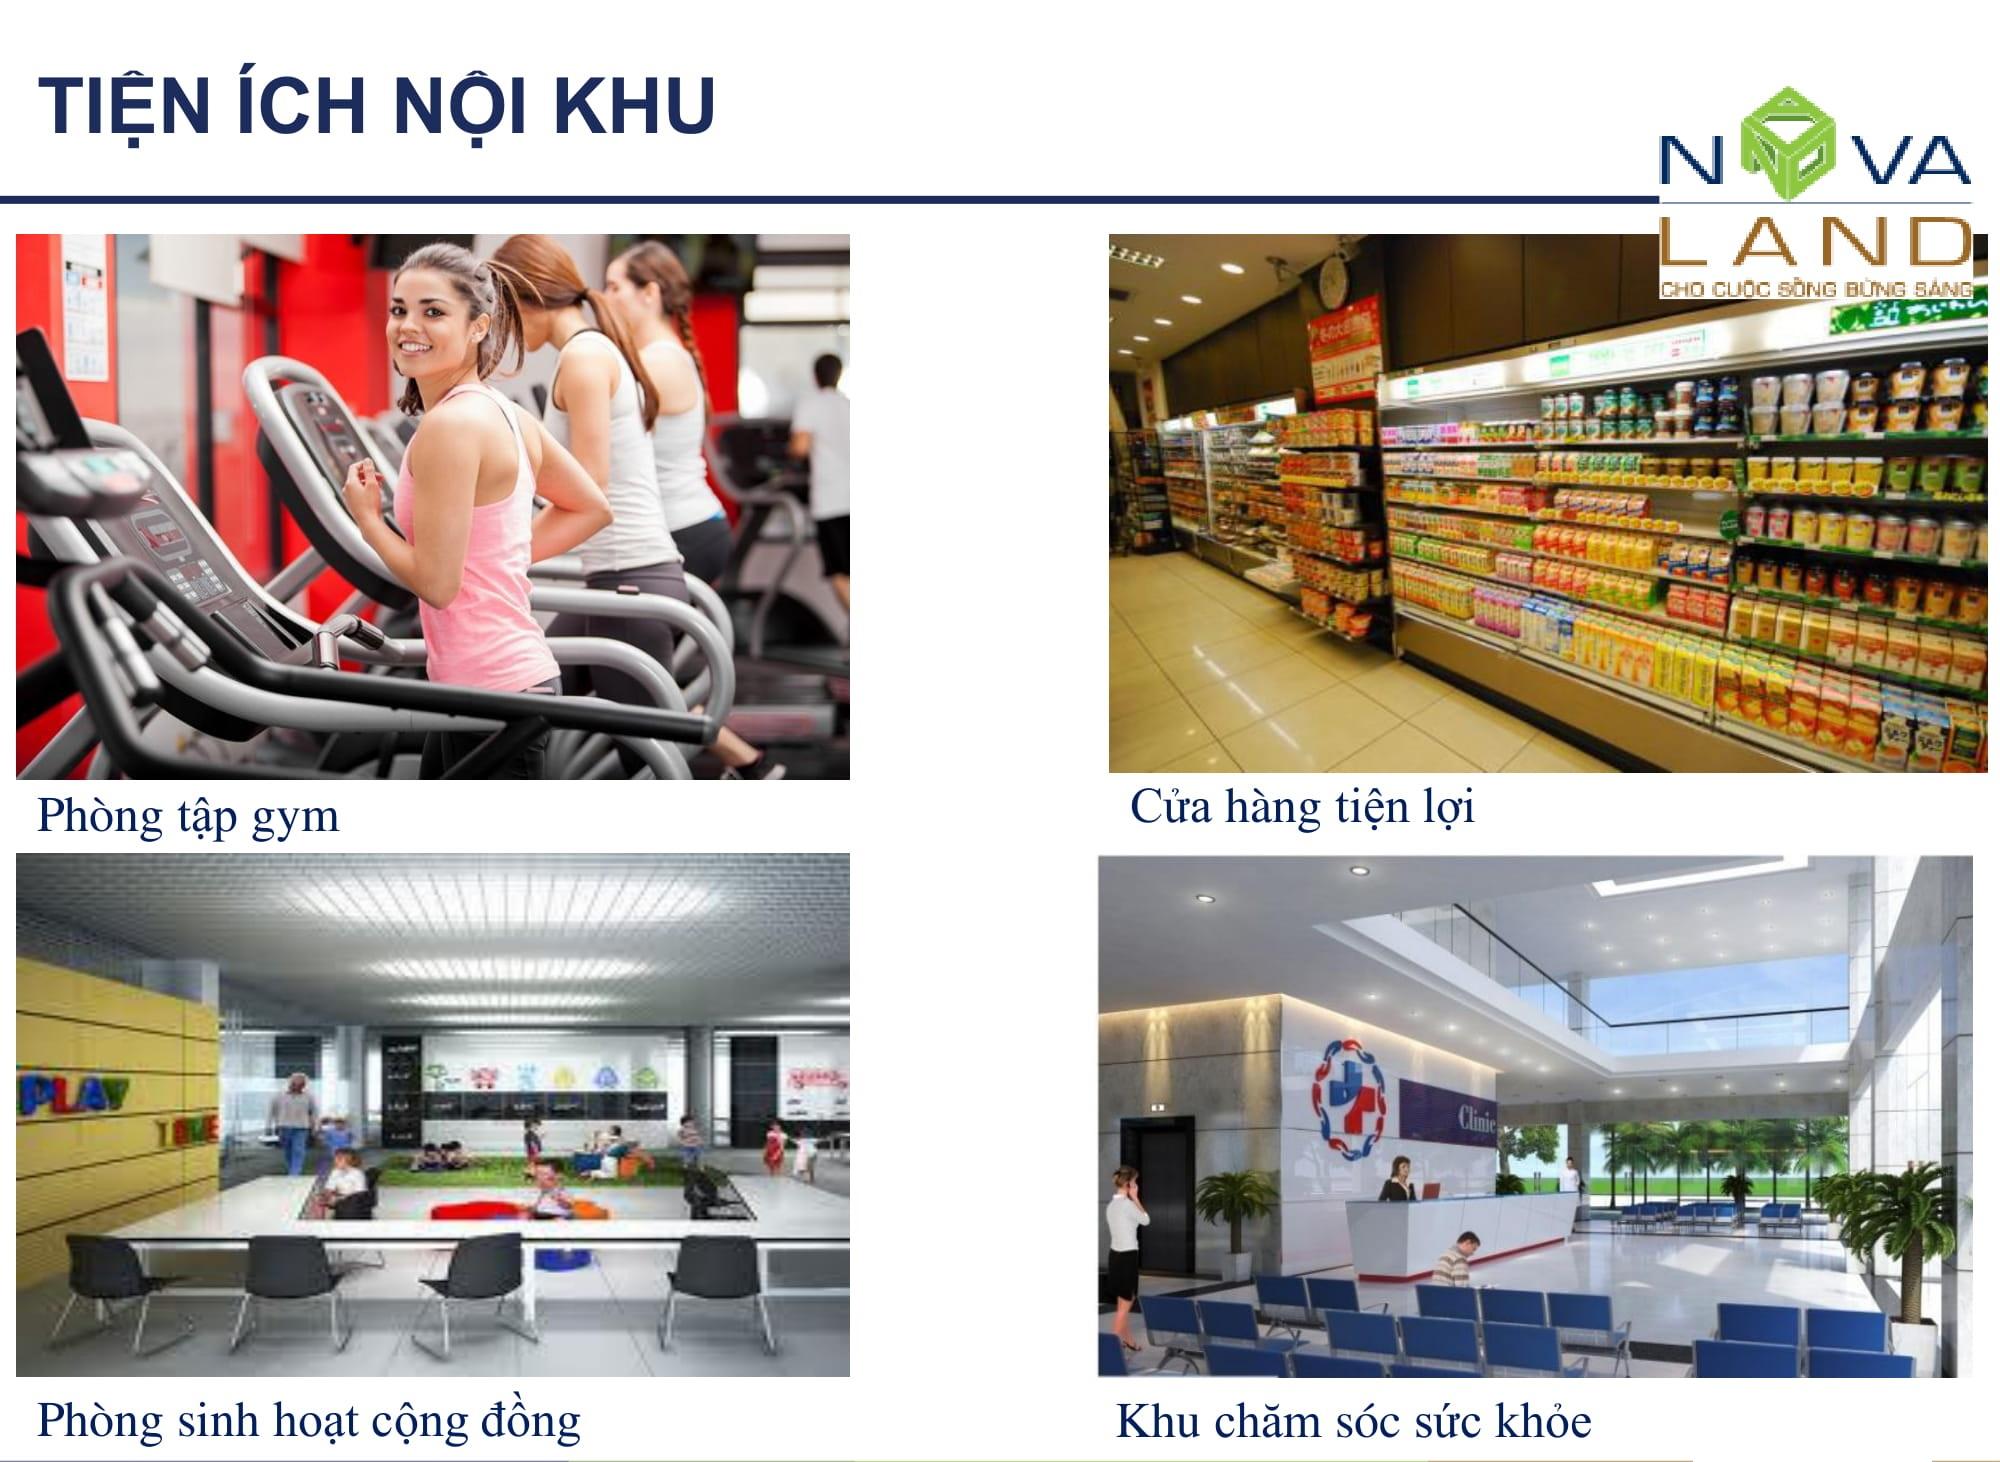 tien-ich-noi-khu-the-sun-avenue